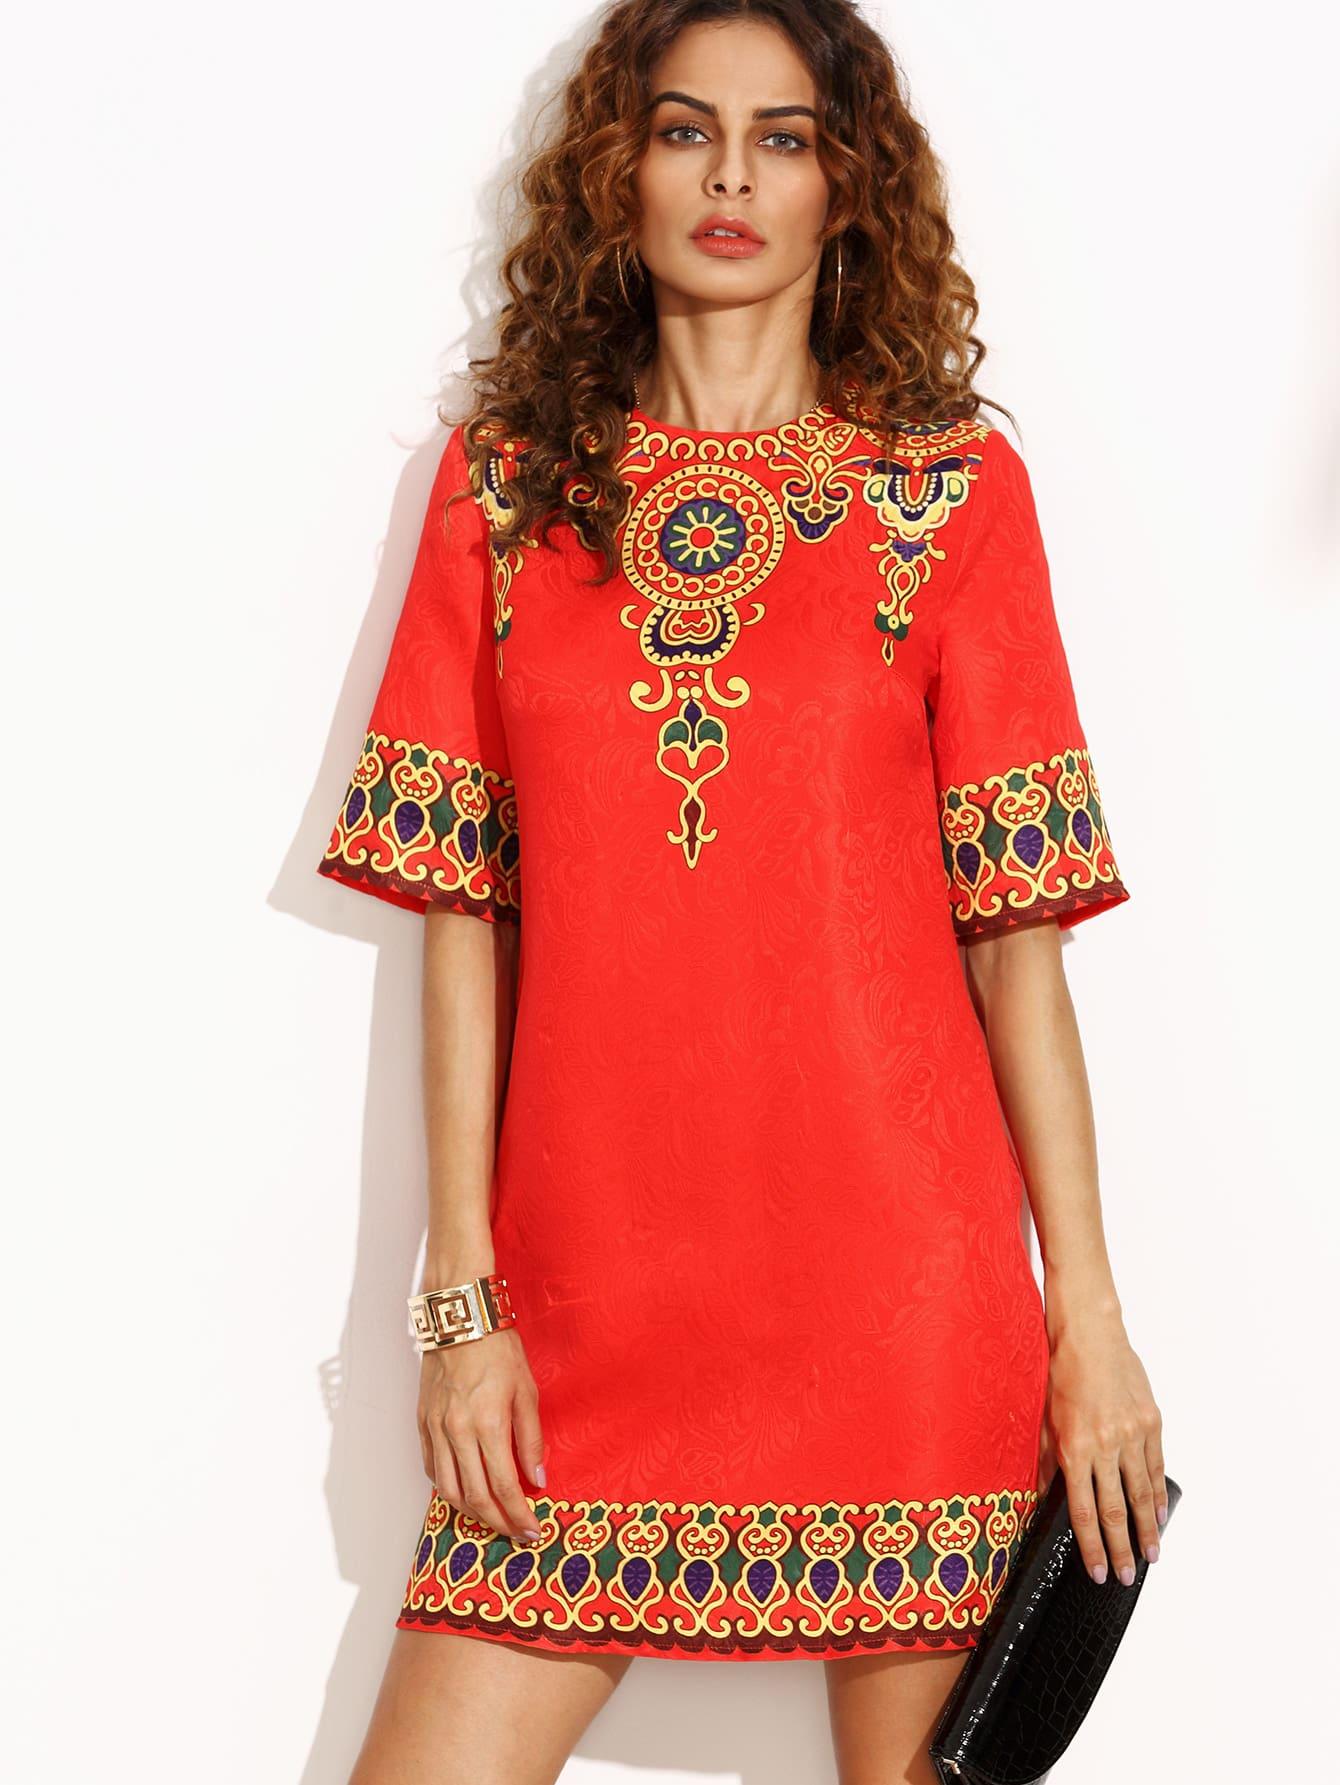 Red Print Half Sleeve Zipper Back Dress dress160809504